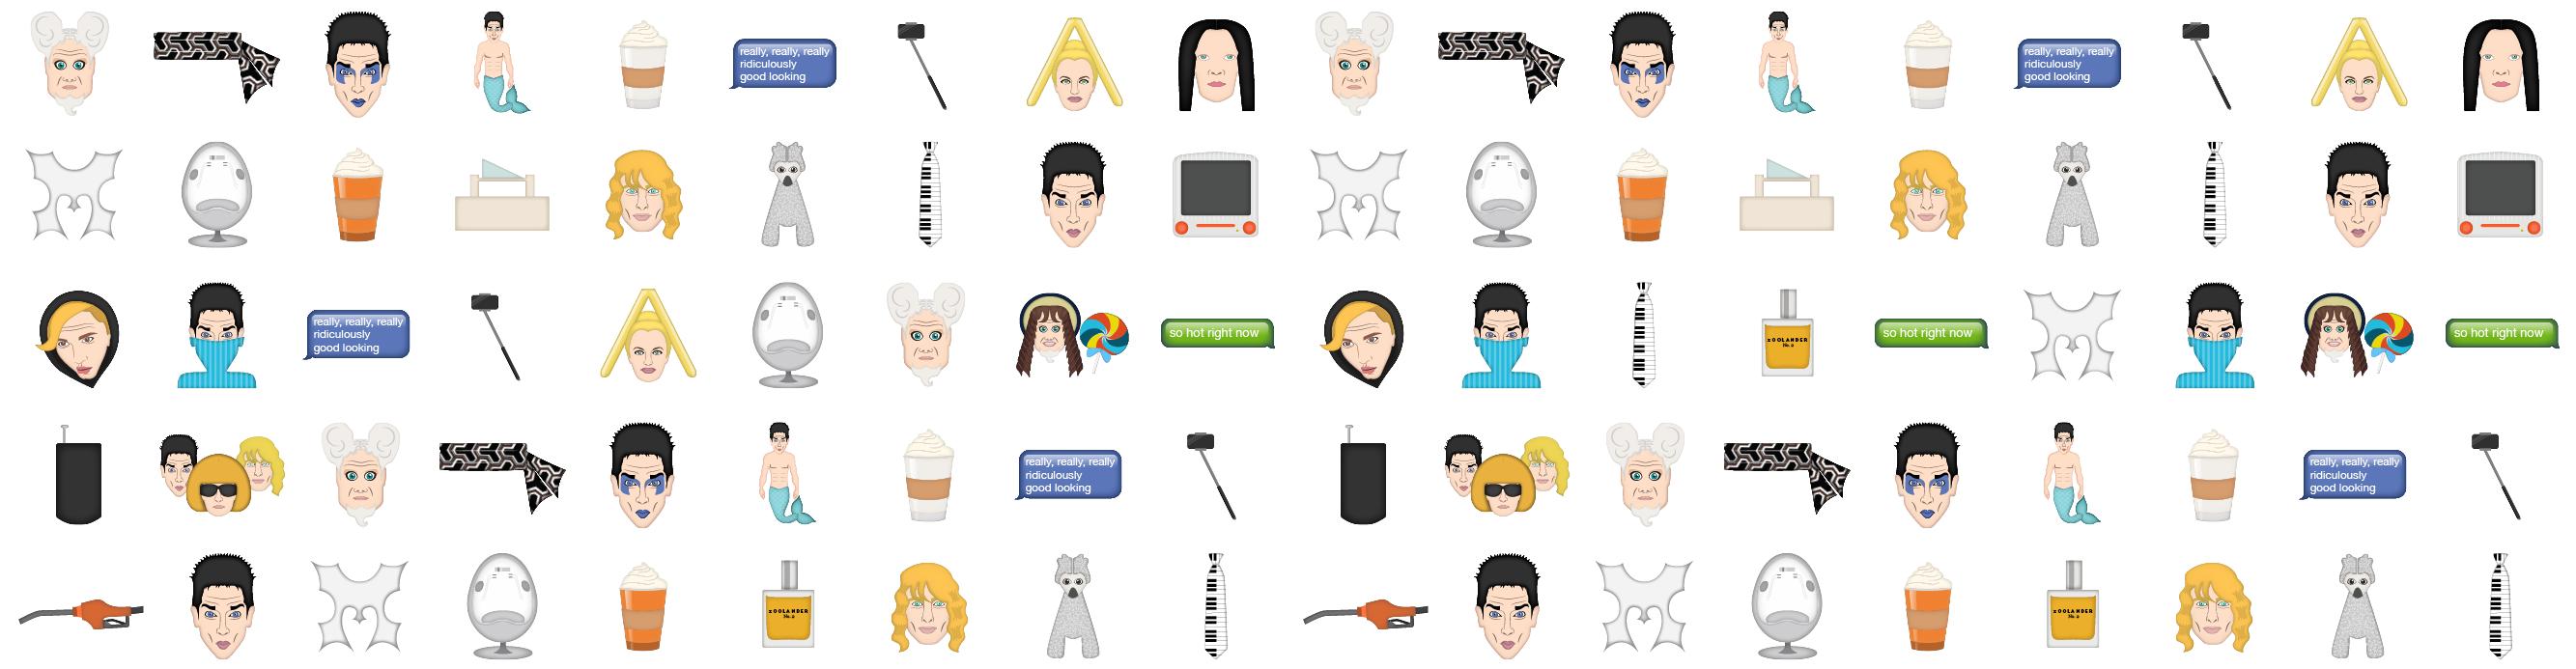 Zoomoji: Zoolander Emojis #infographic